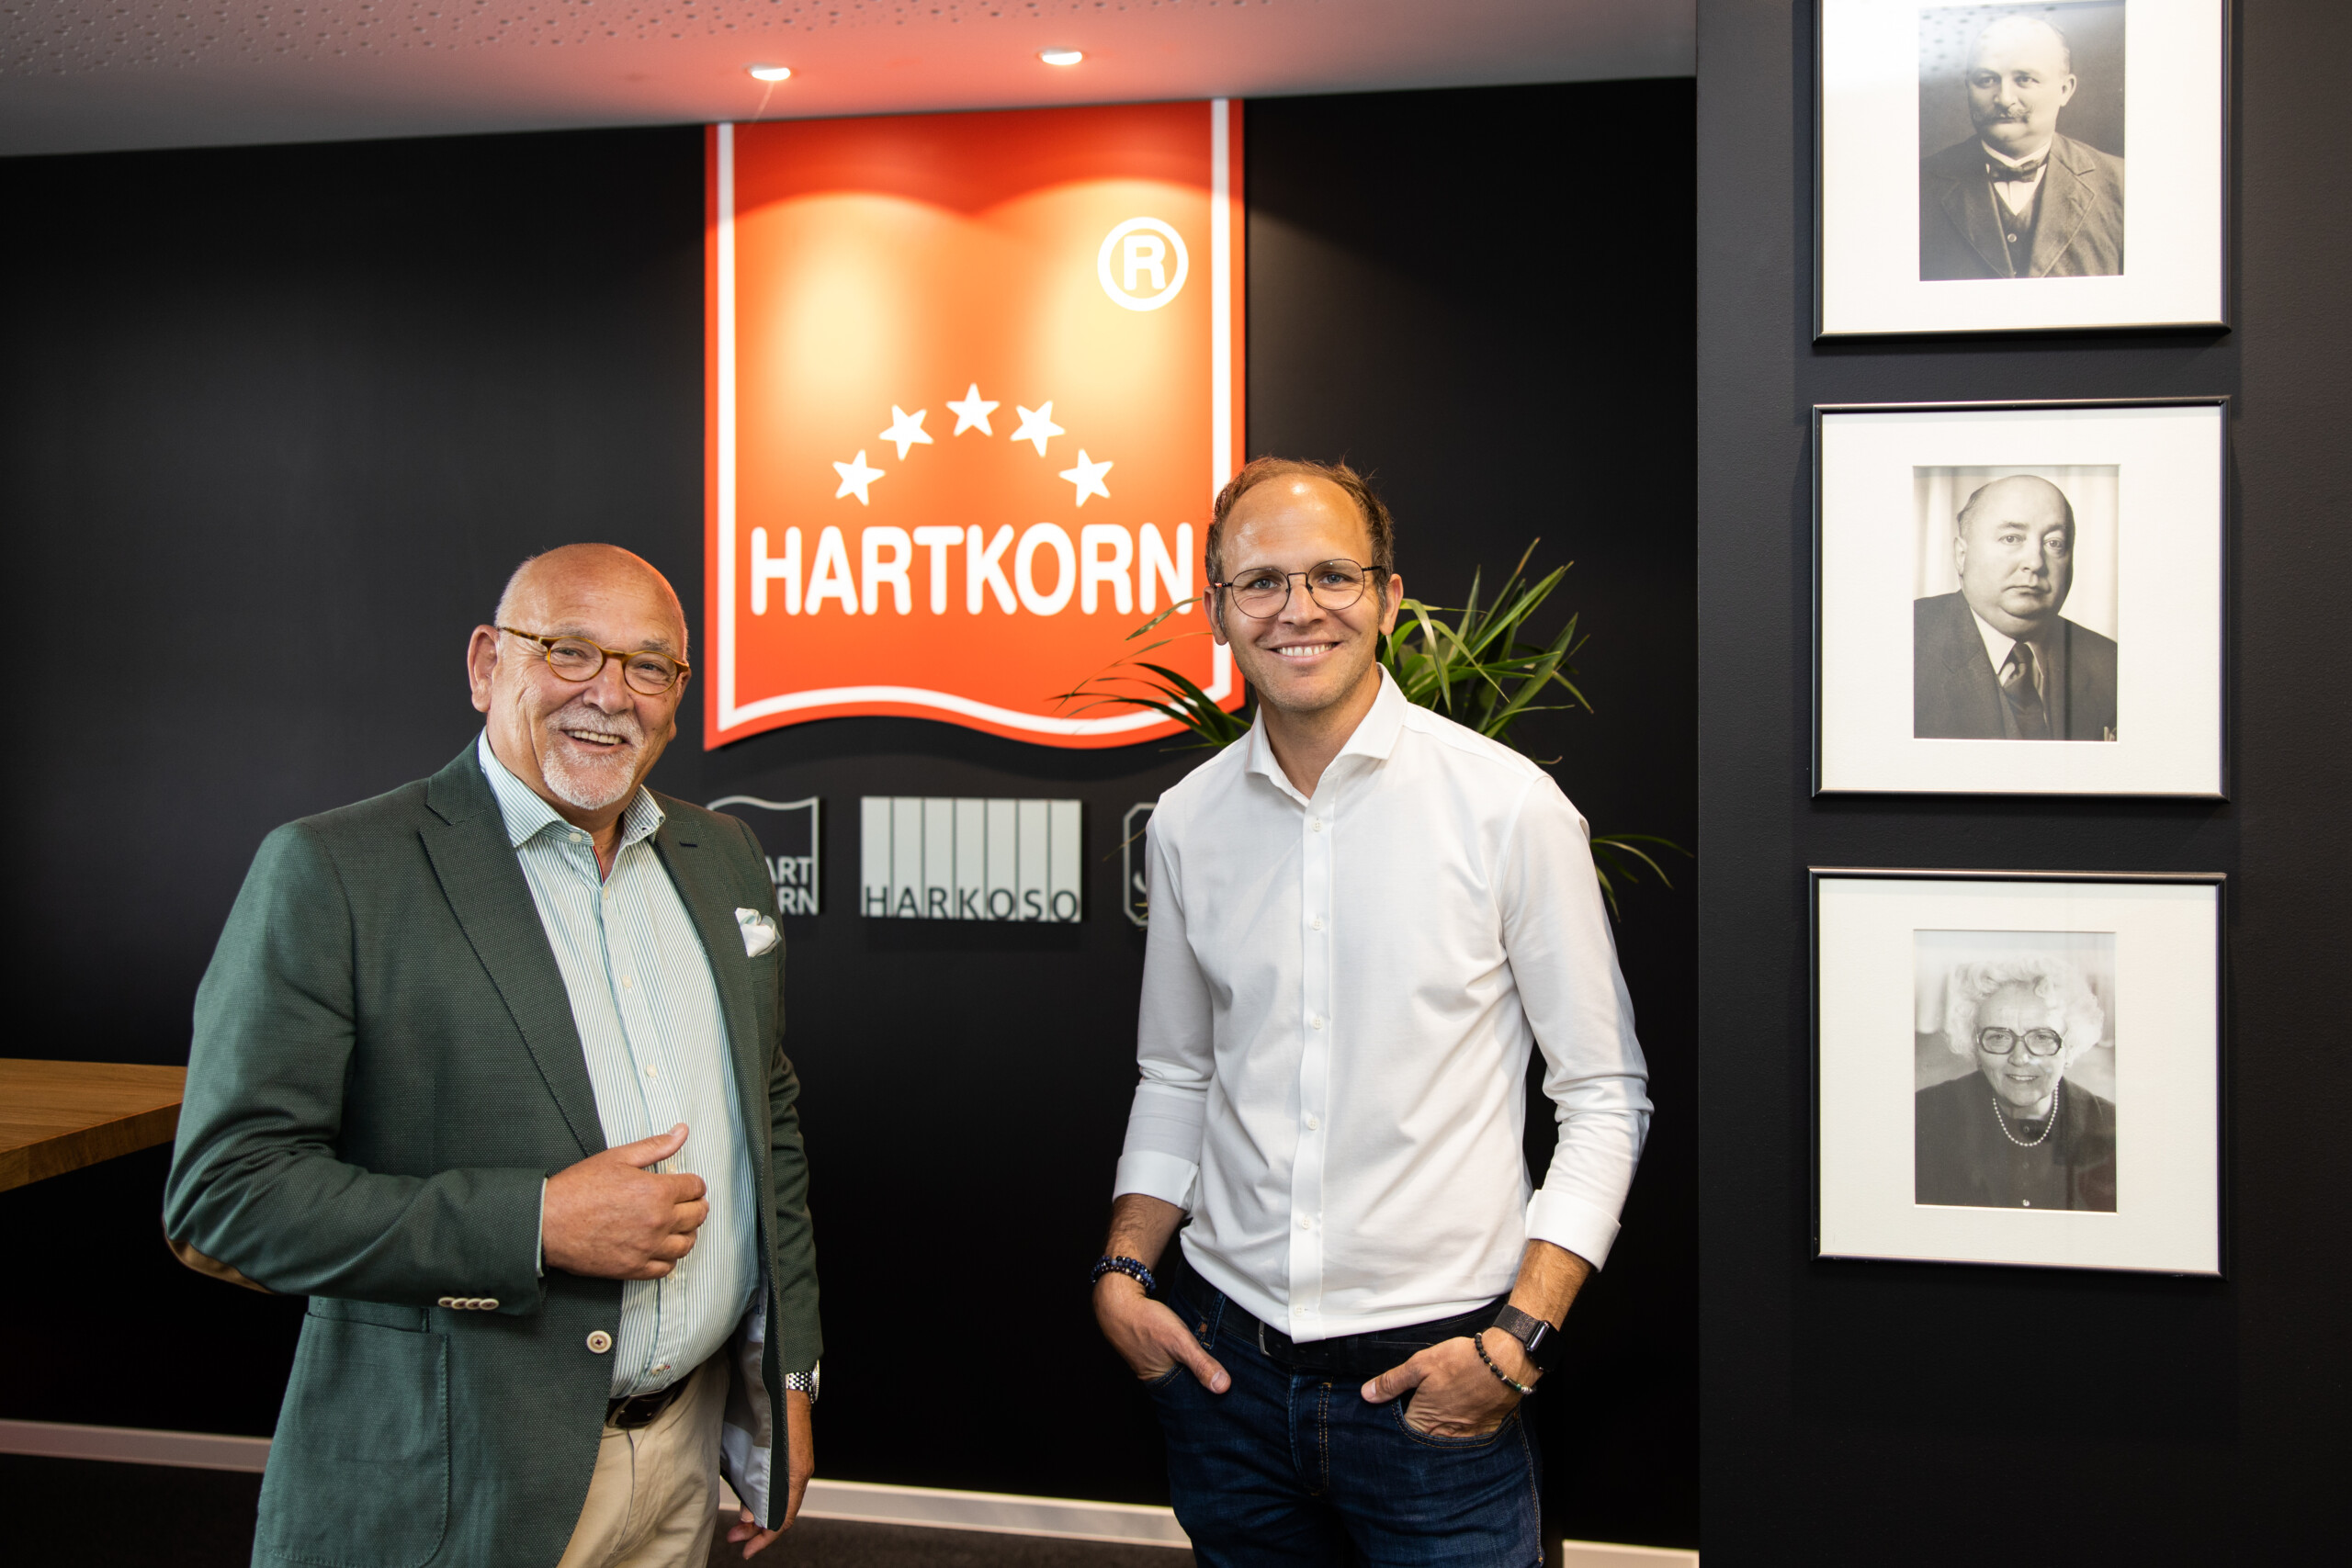 Hans Dieter Hartkorn und Dr. Andreas Hartkorn